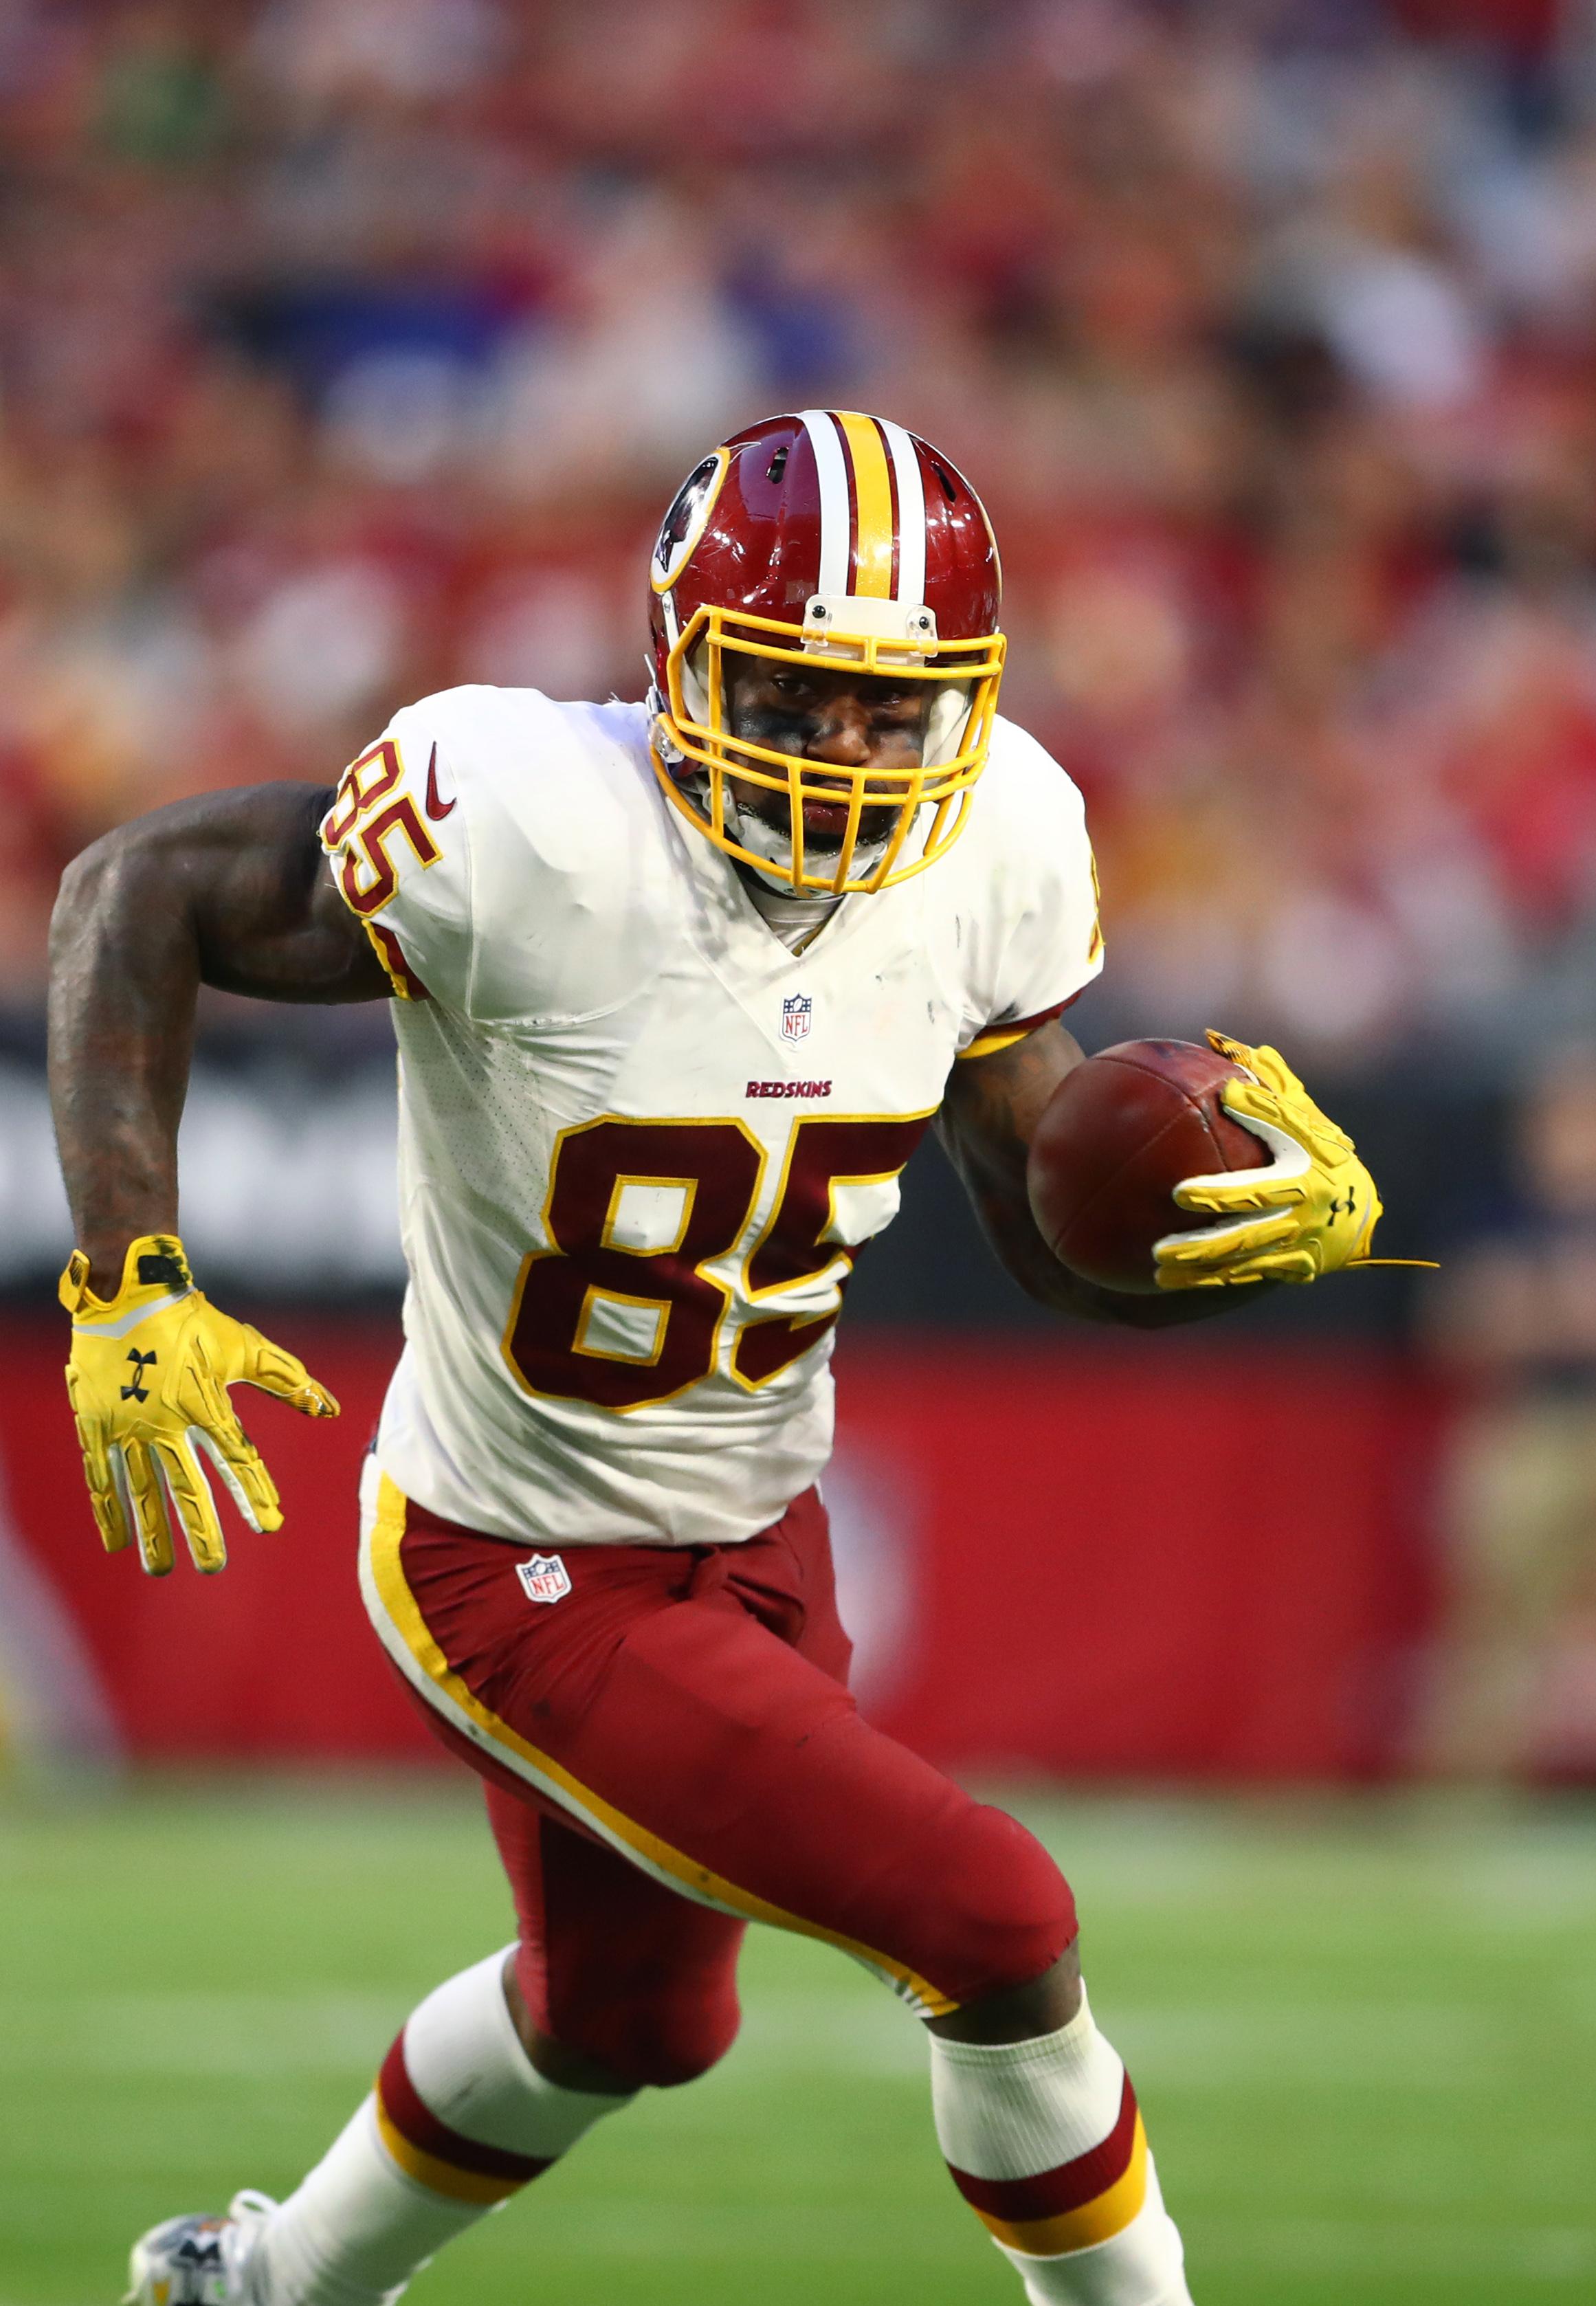 online store 7a84d 9469c Redskins Re-Sign TE Vernon Davis